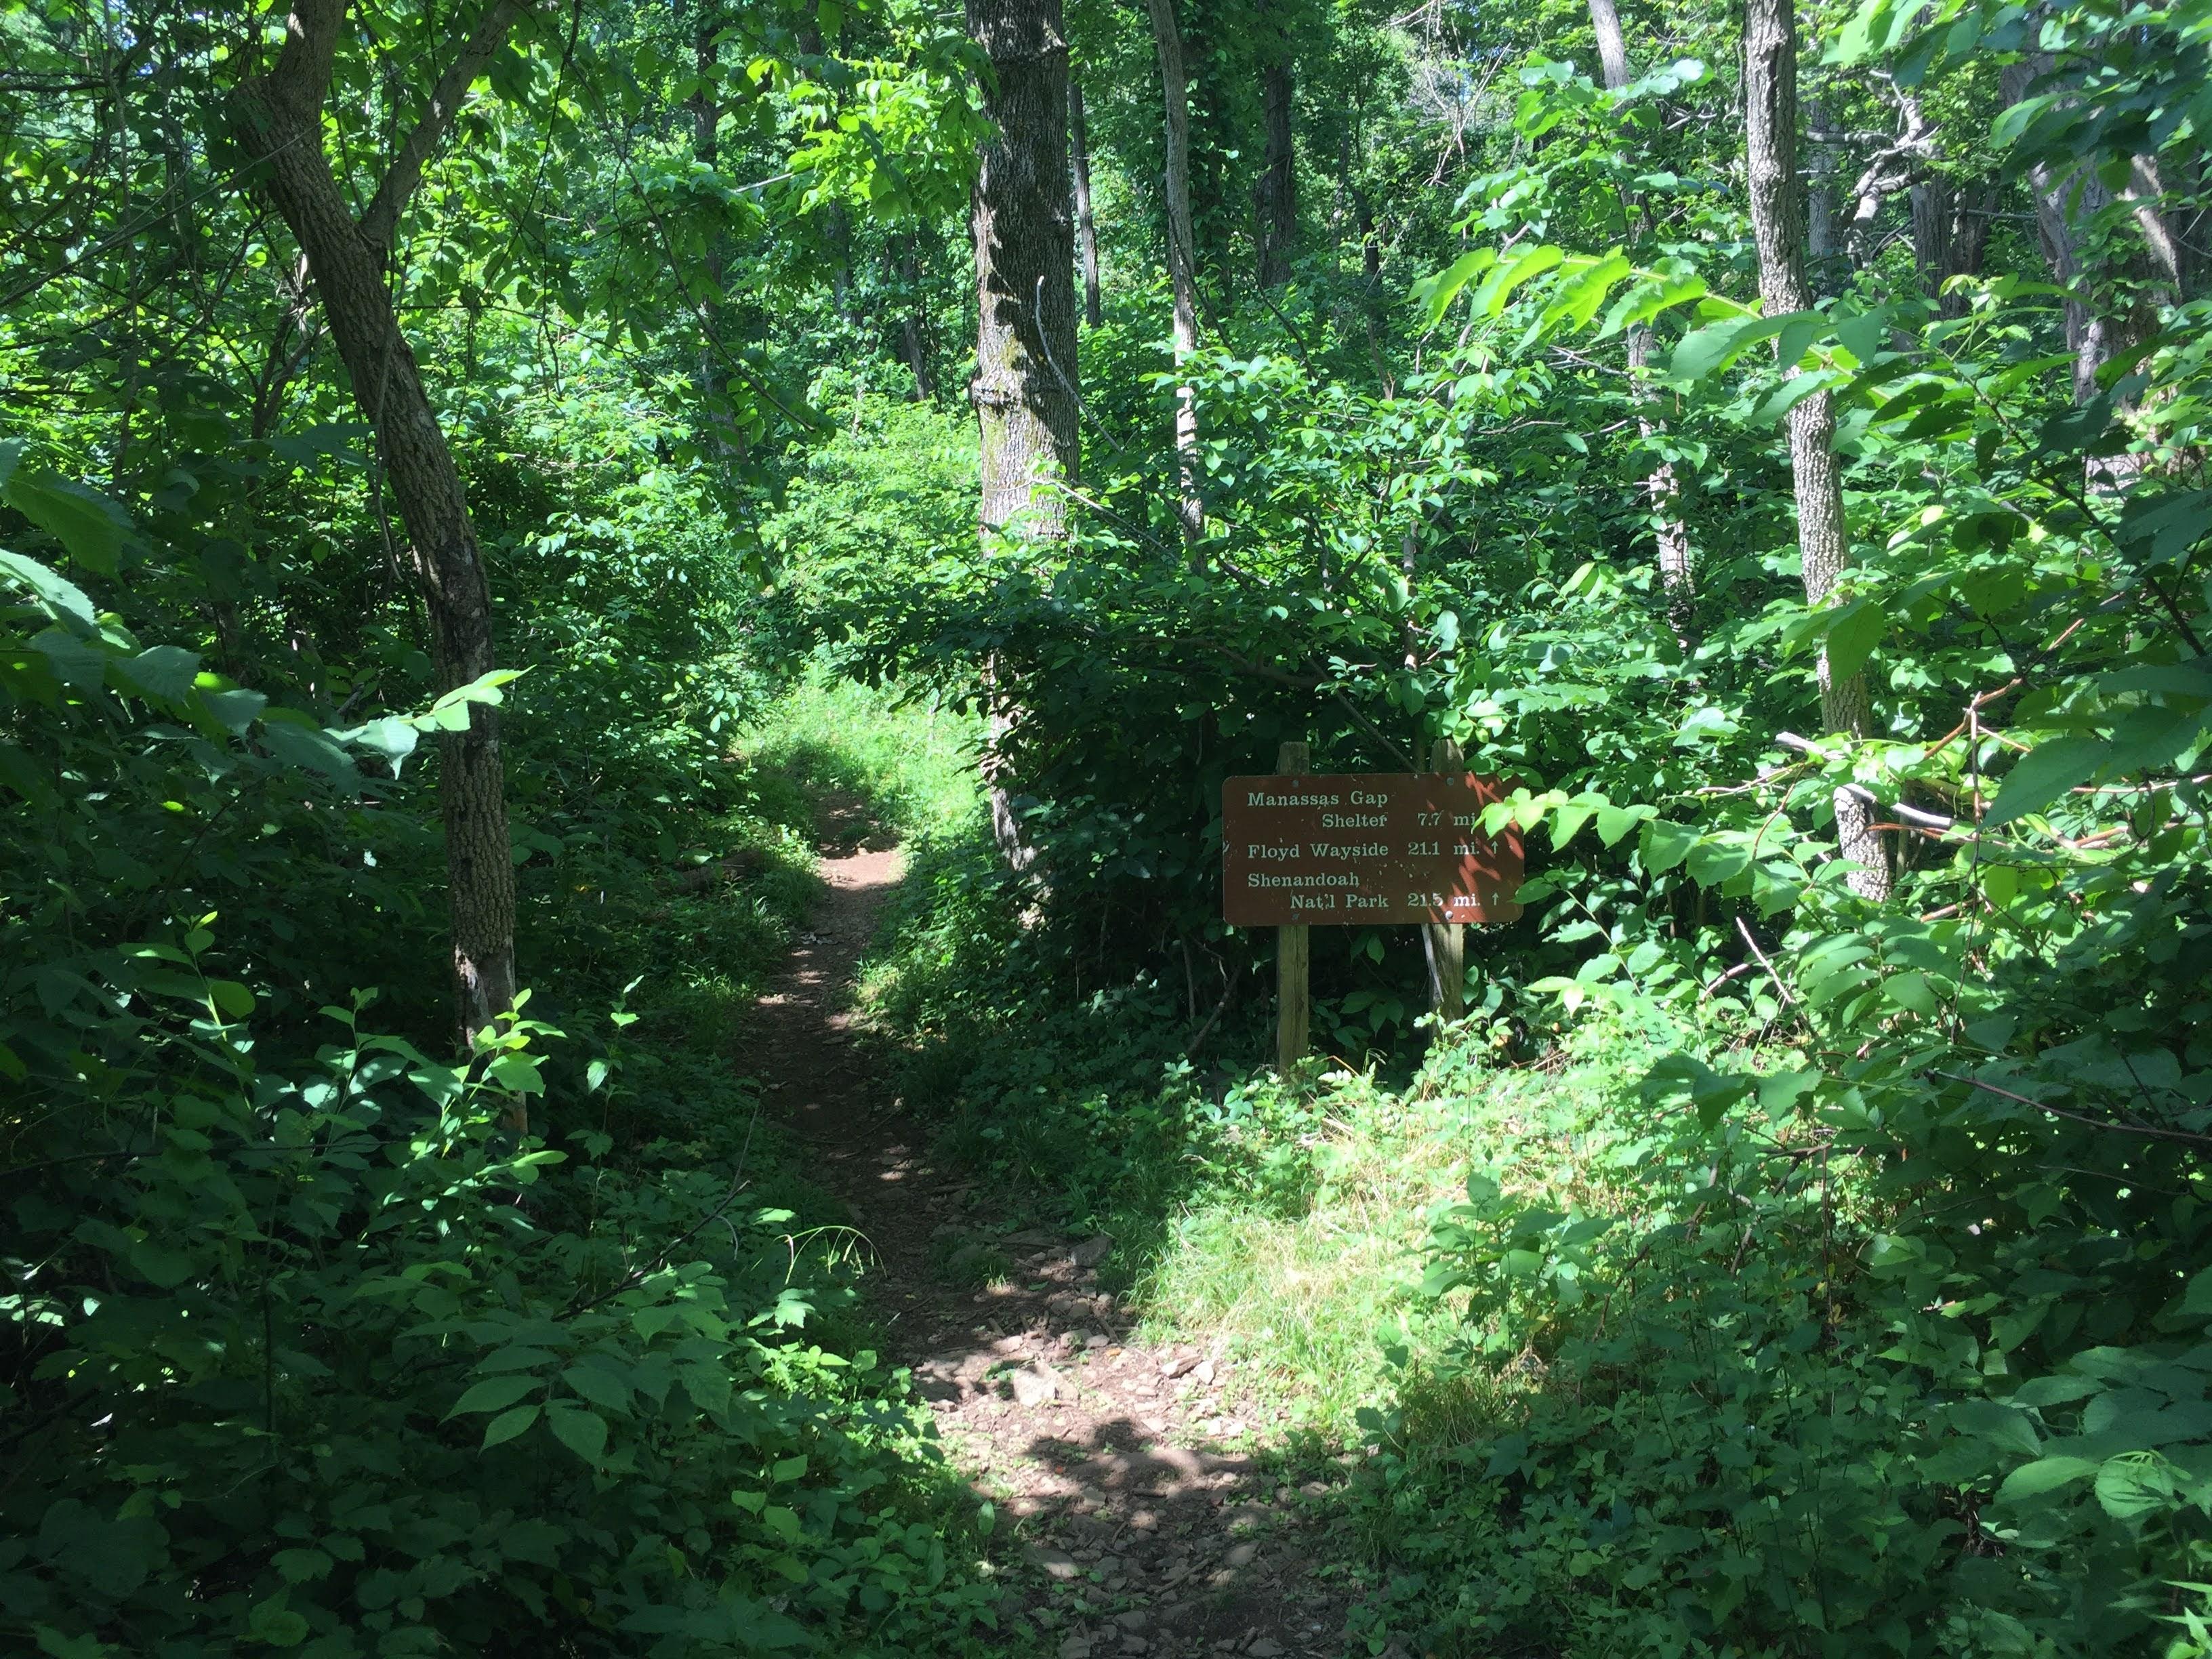 Sky Meadows Appalachian Trail Section